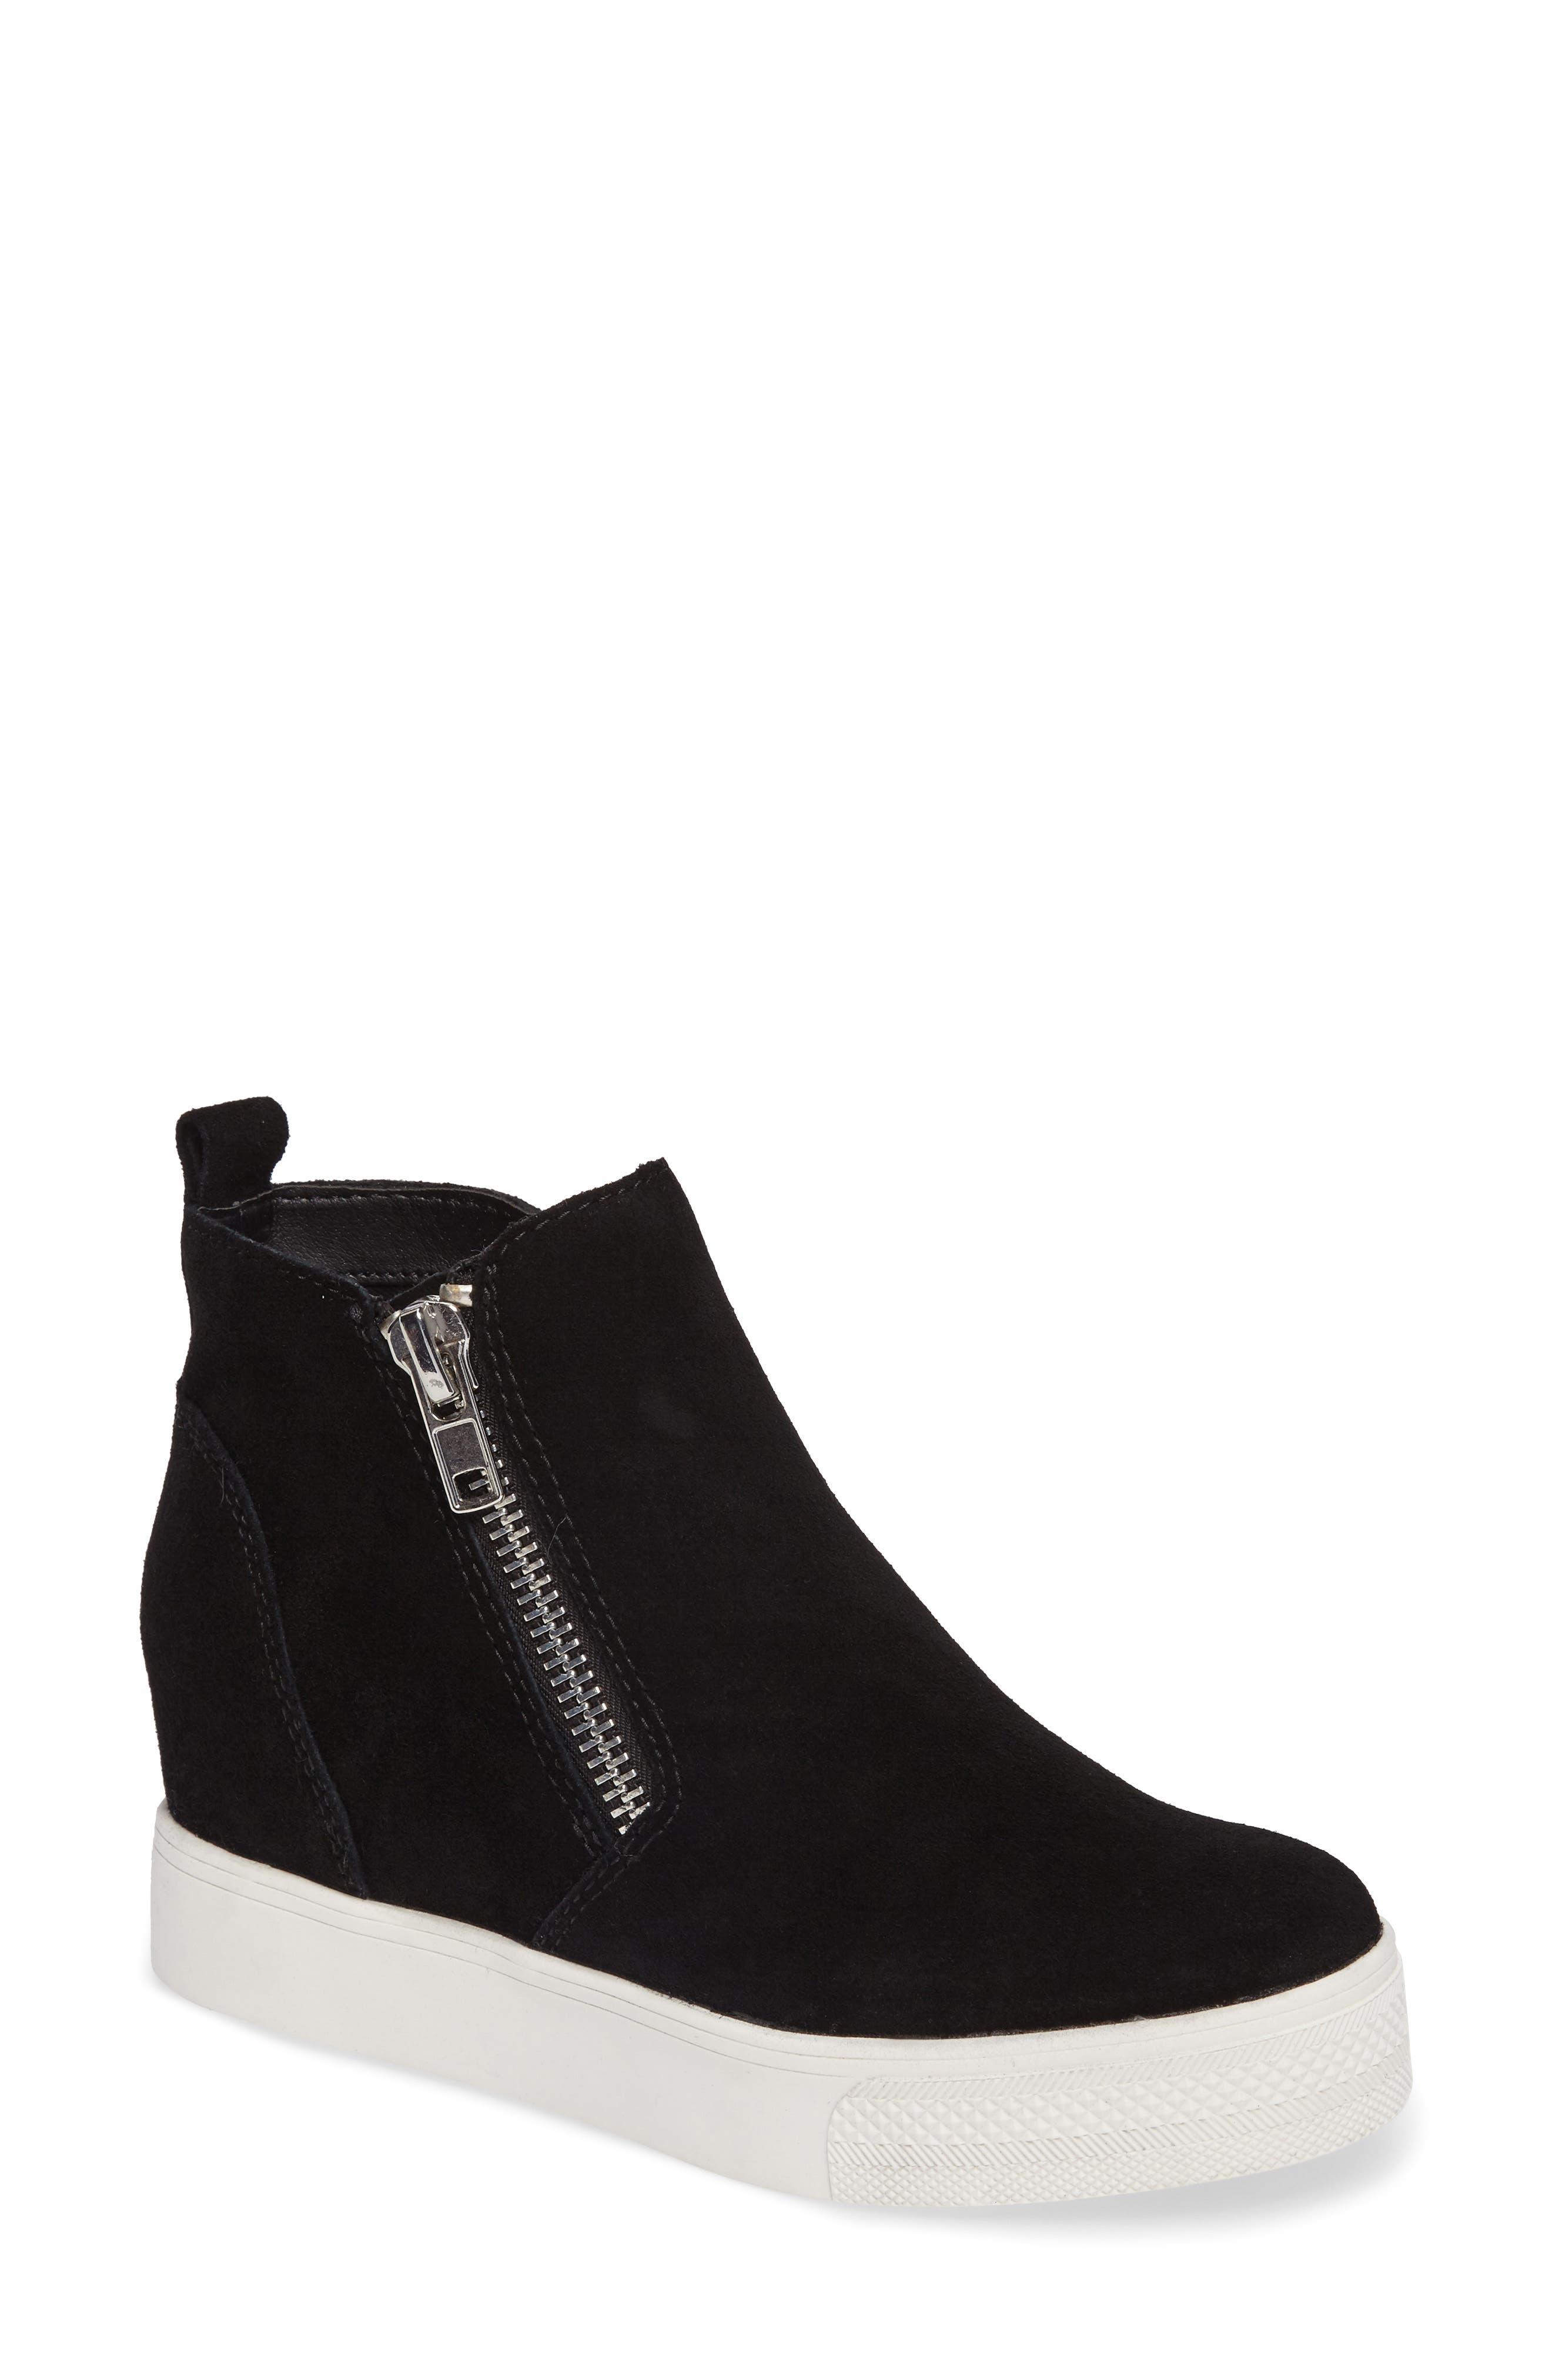 Alternate Image 1 Selected - Steve Madden Wedgie High Top Platform Sneaker (Women)